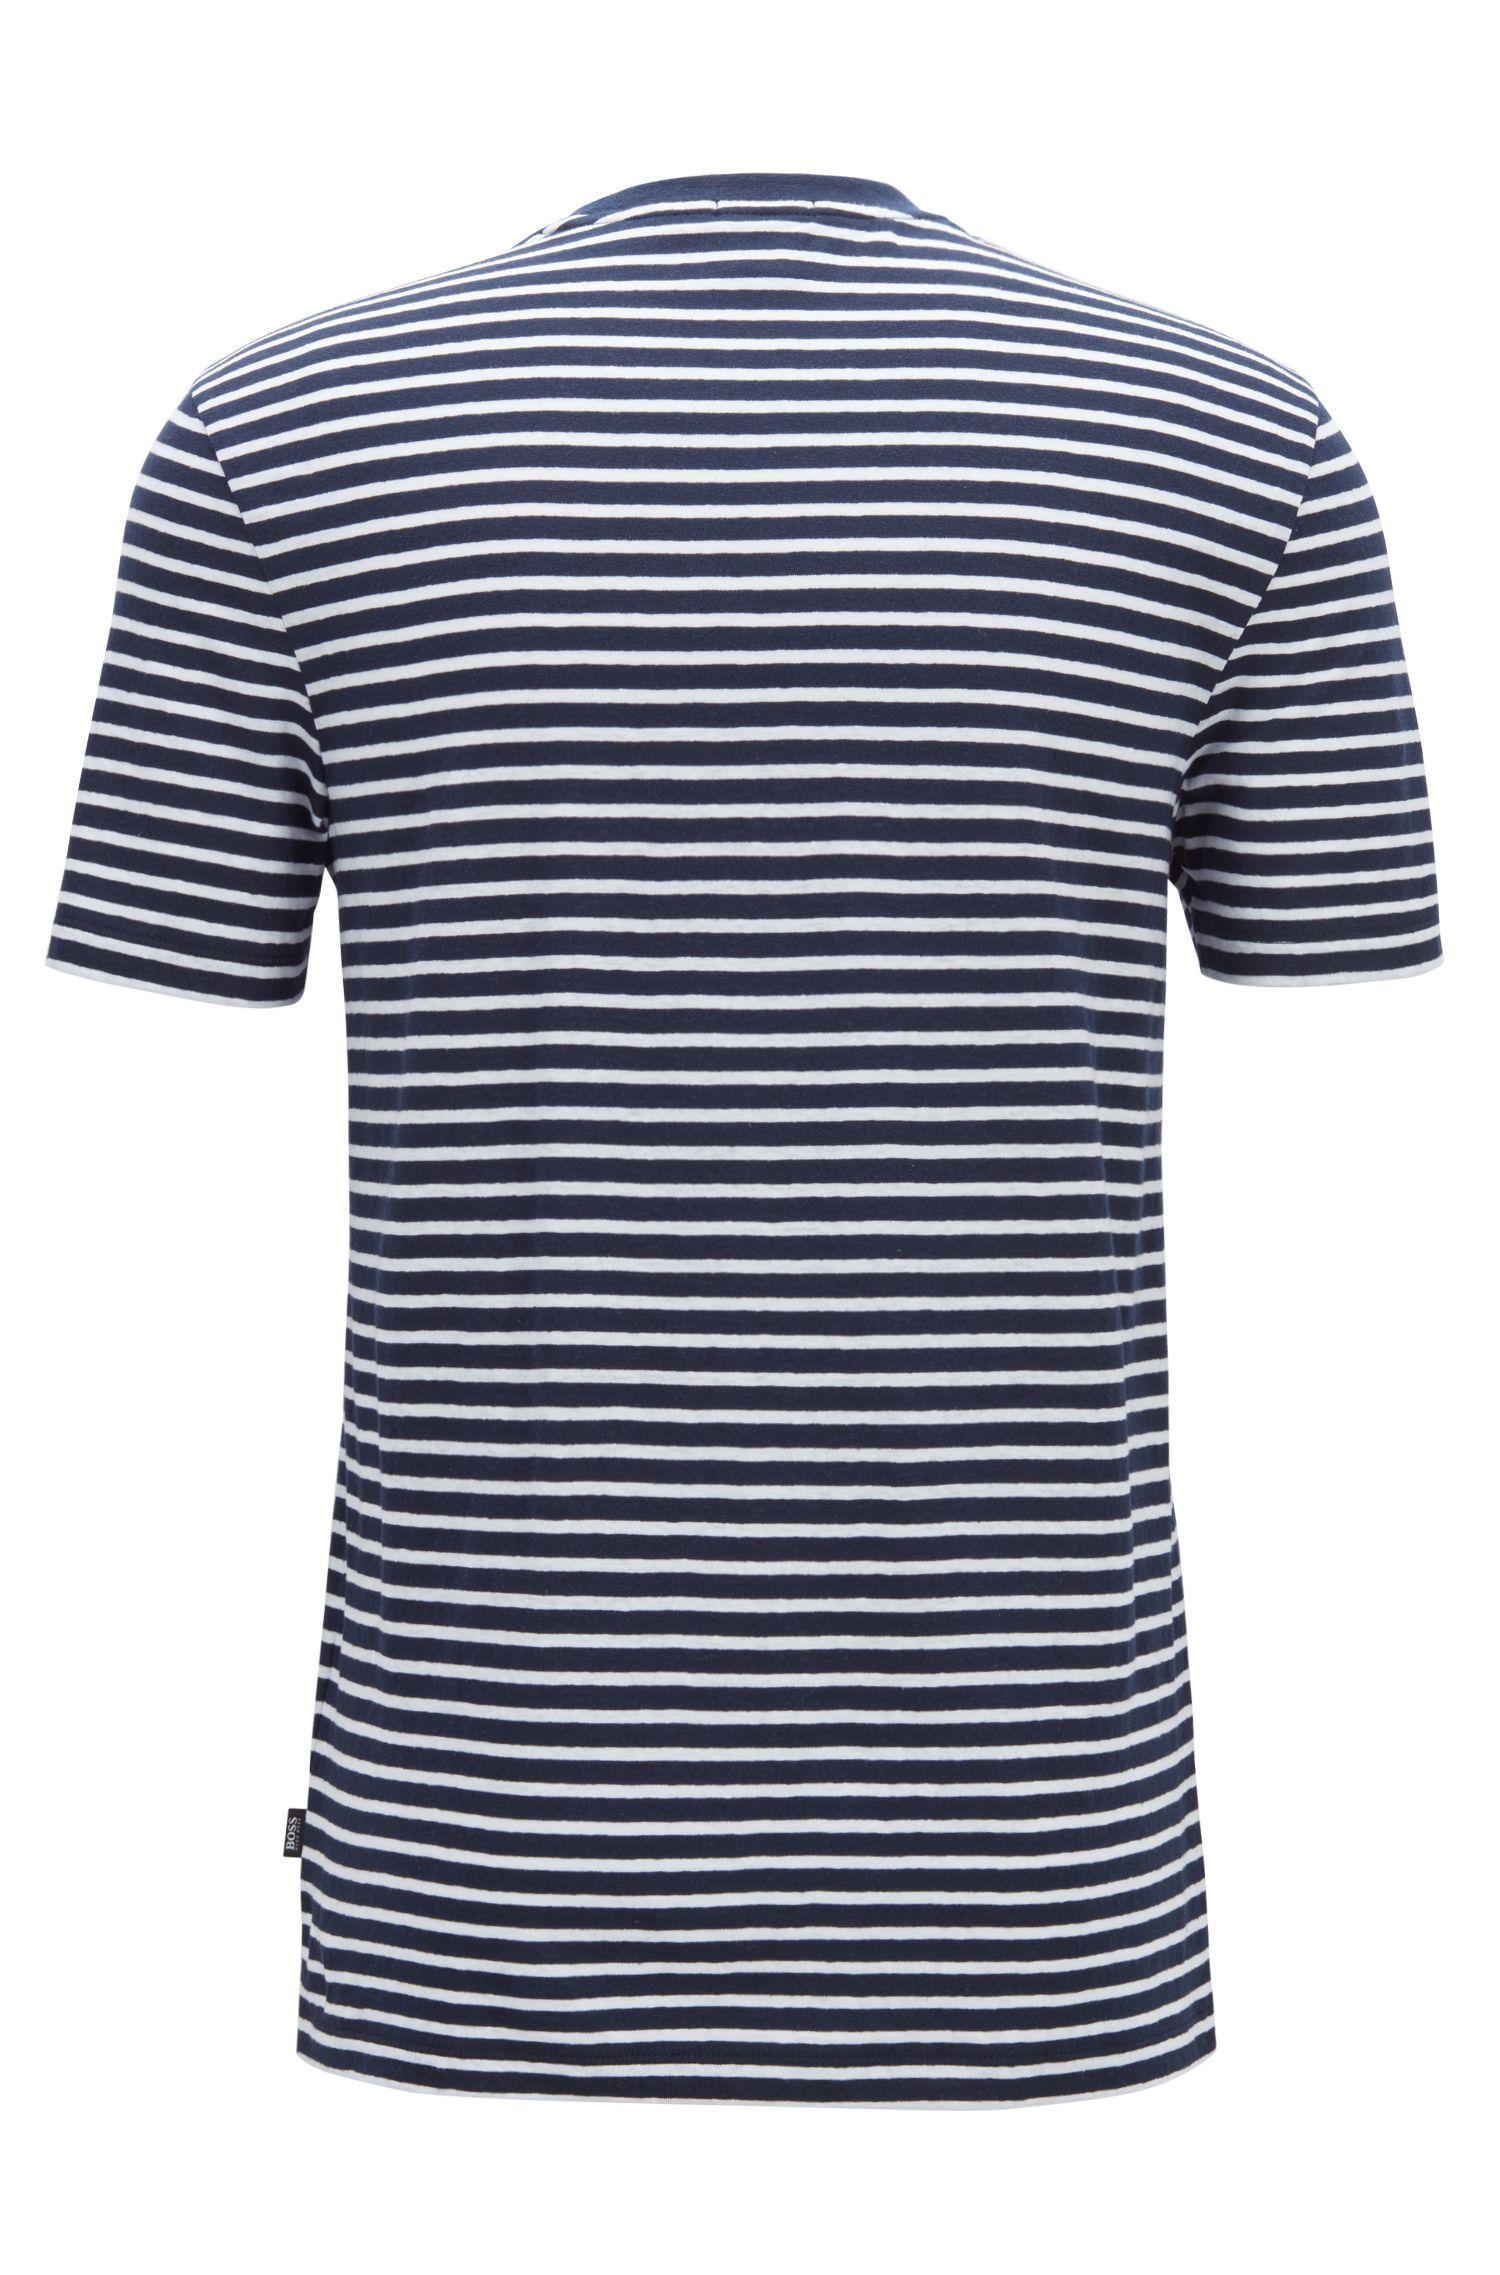 Crew-neck T-shirt in a striped linen-cotton blend, Dark Blue